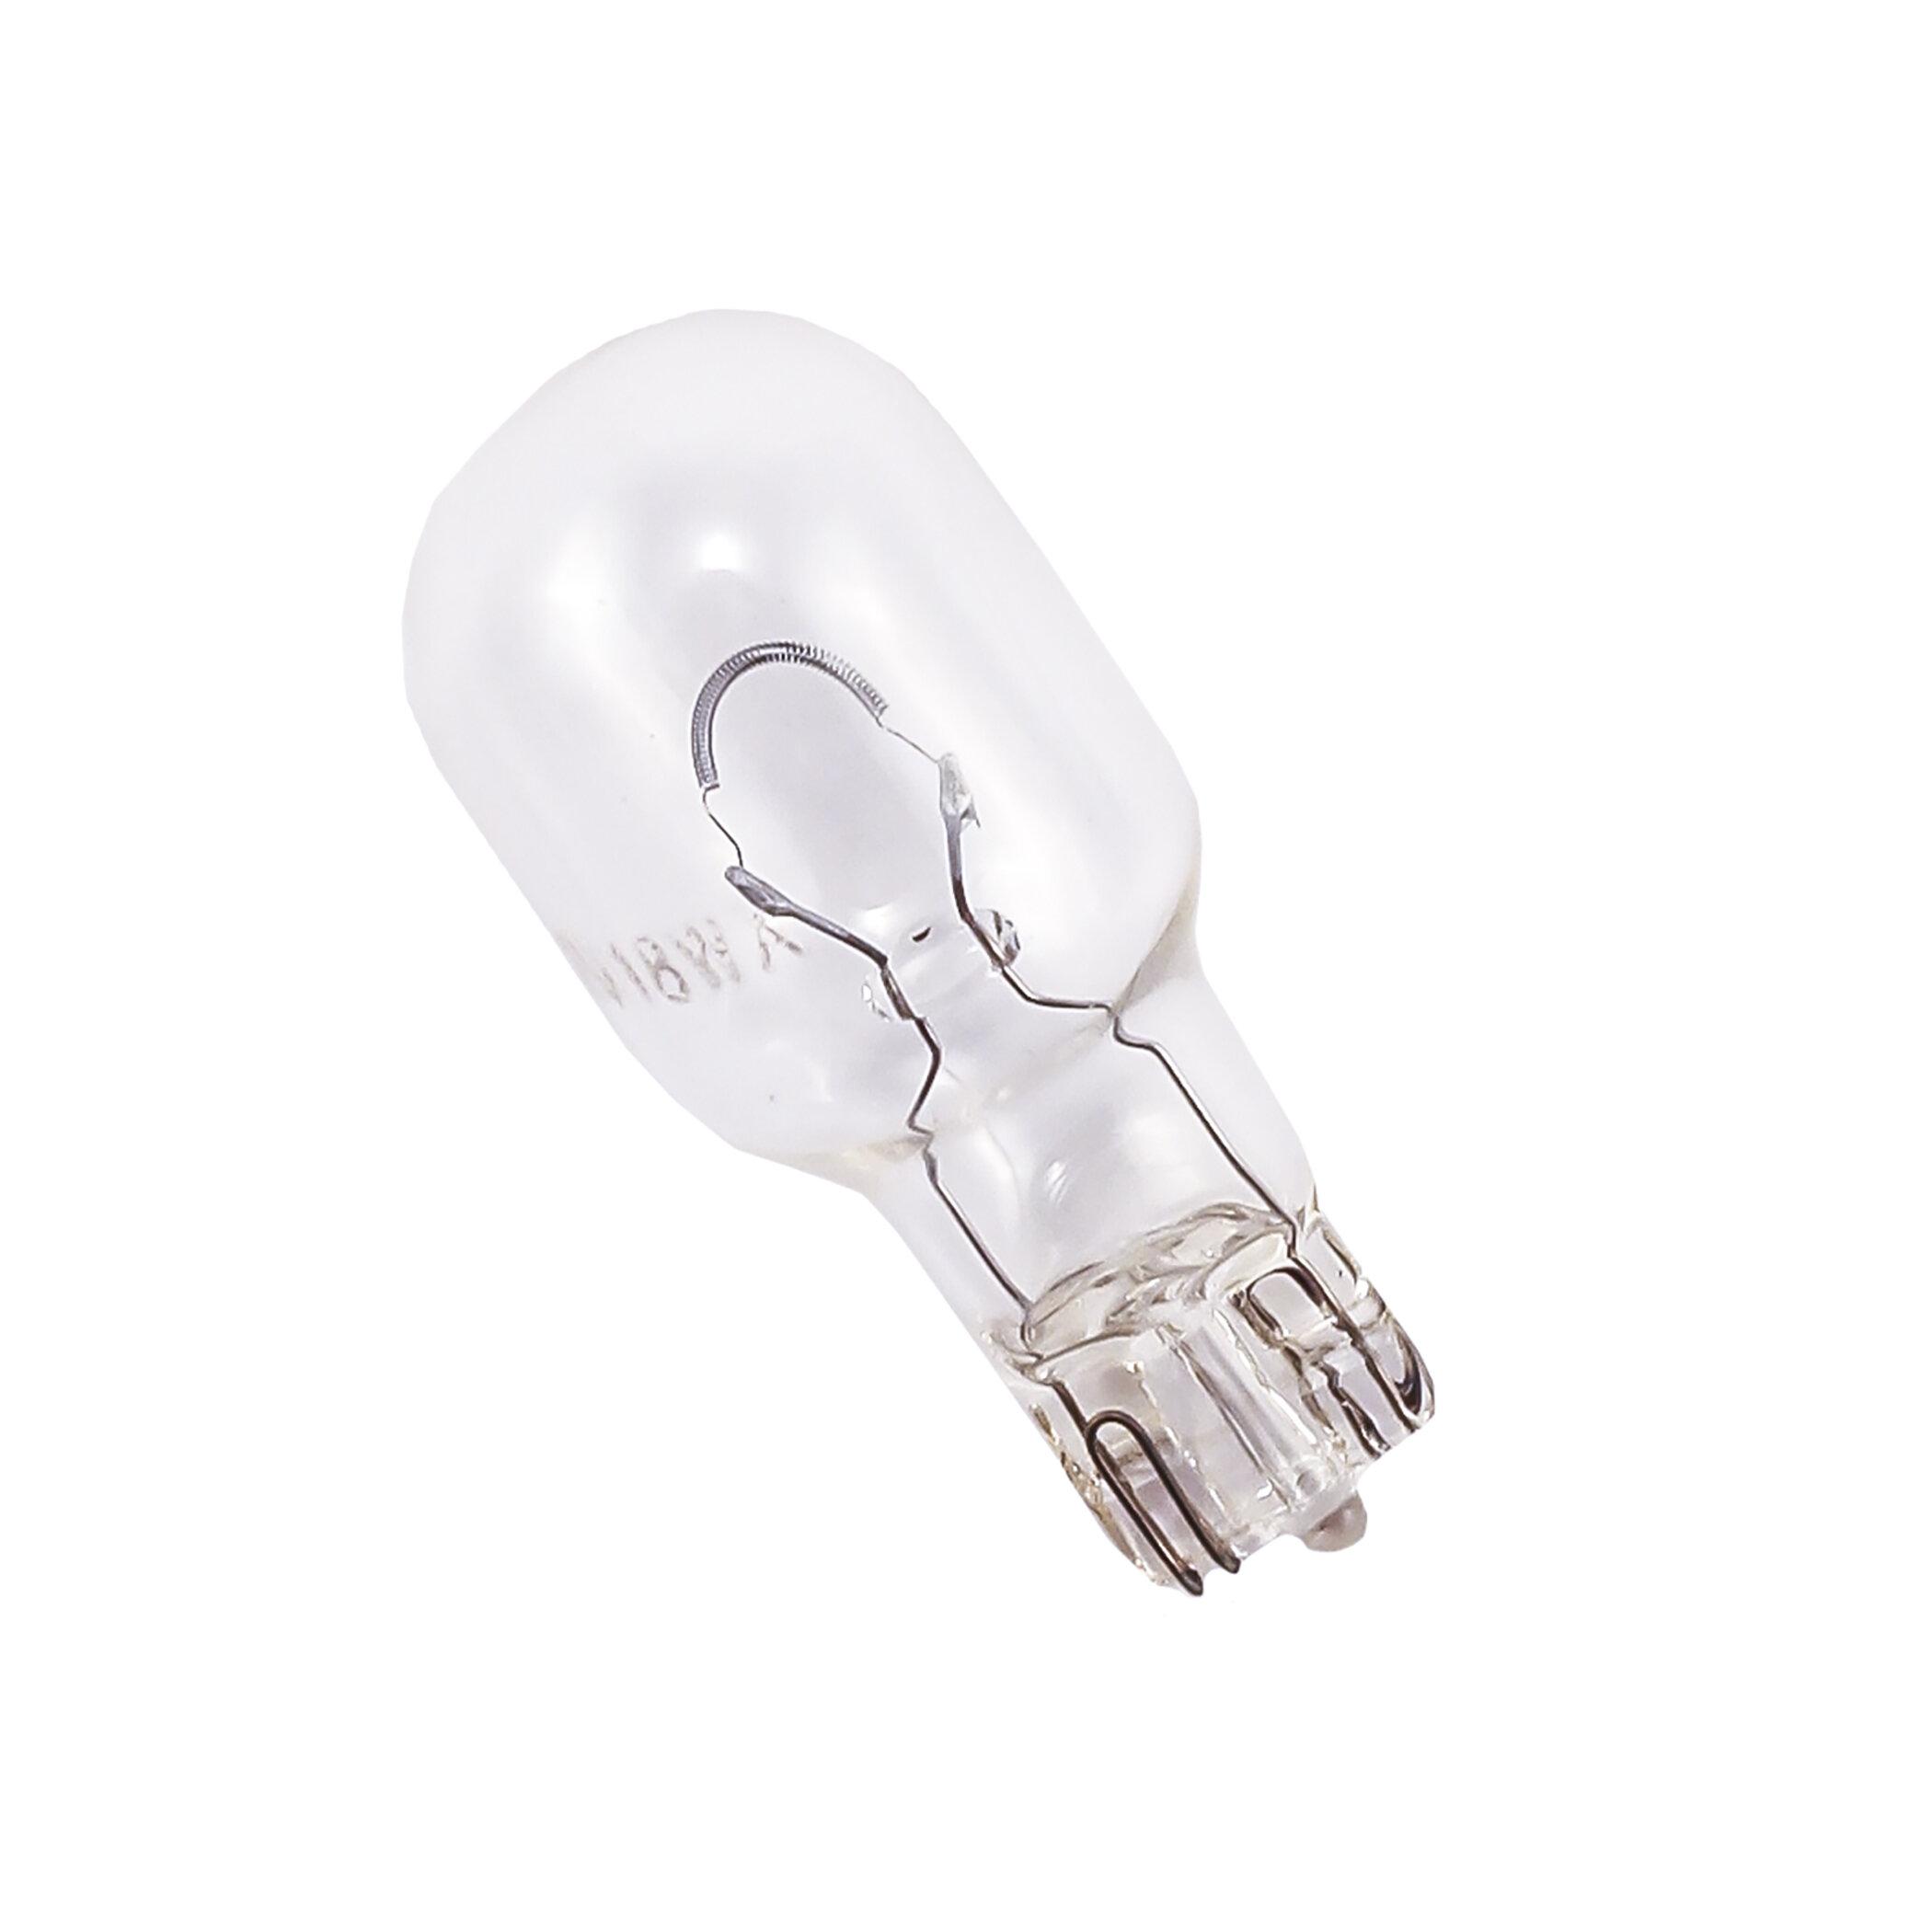 nanchang ltd xenon aesculap short exploitation english xbo co lamp source temp light axel technology asp arc